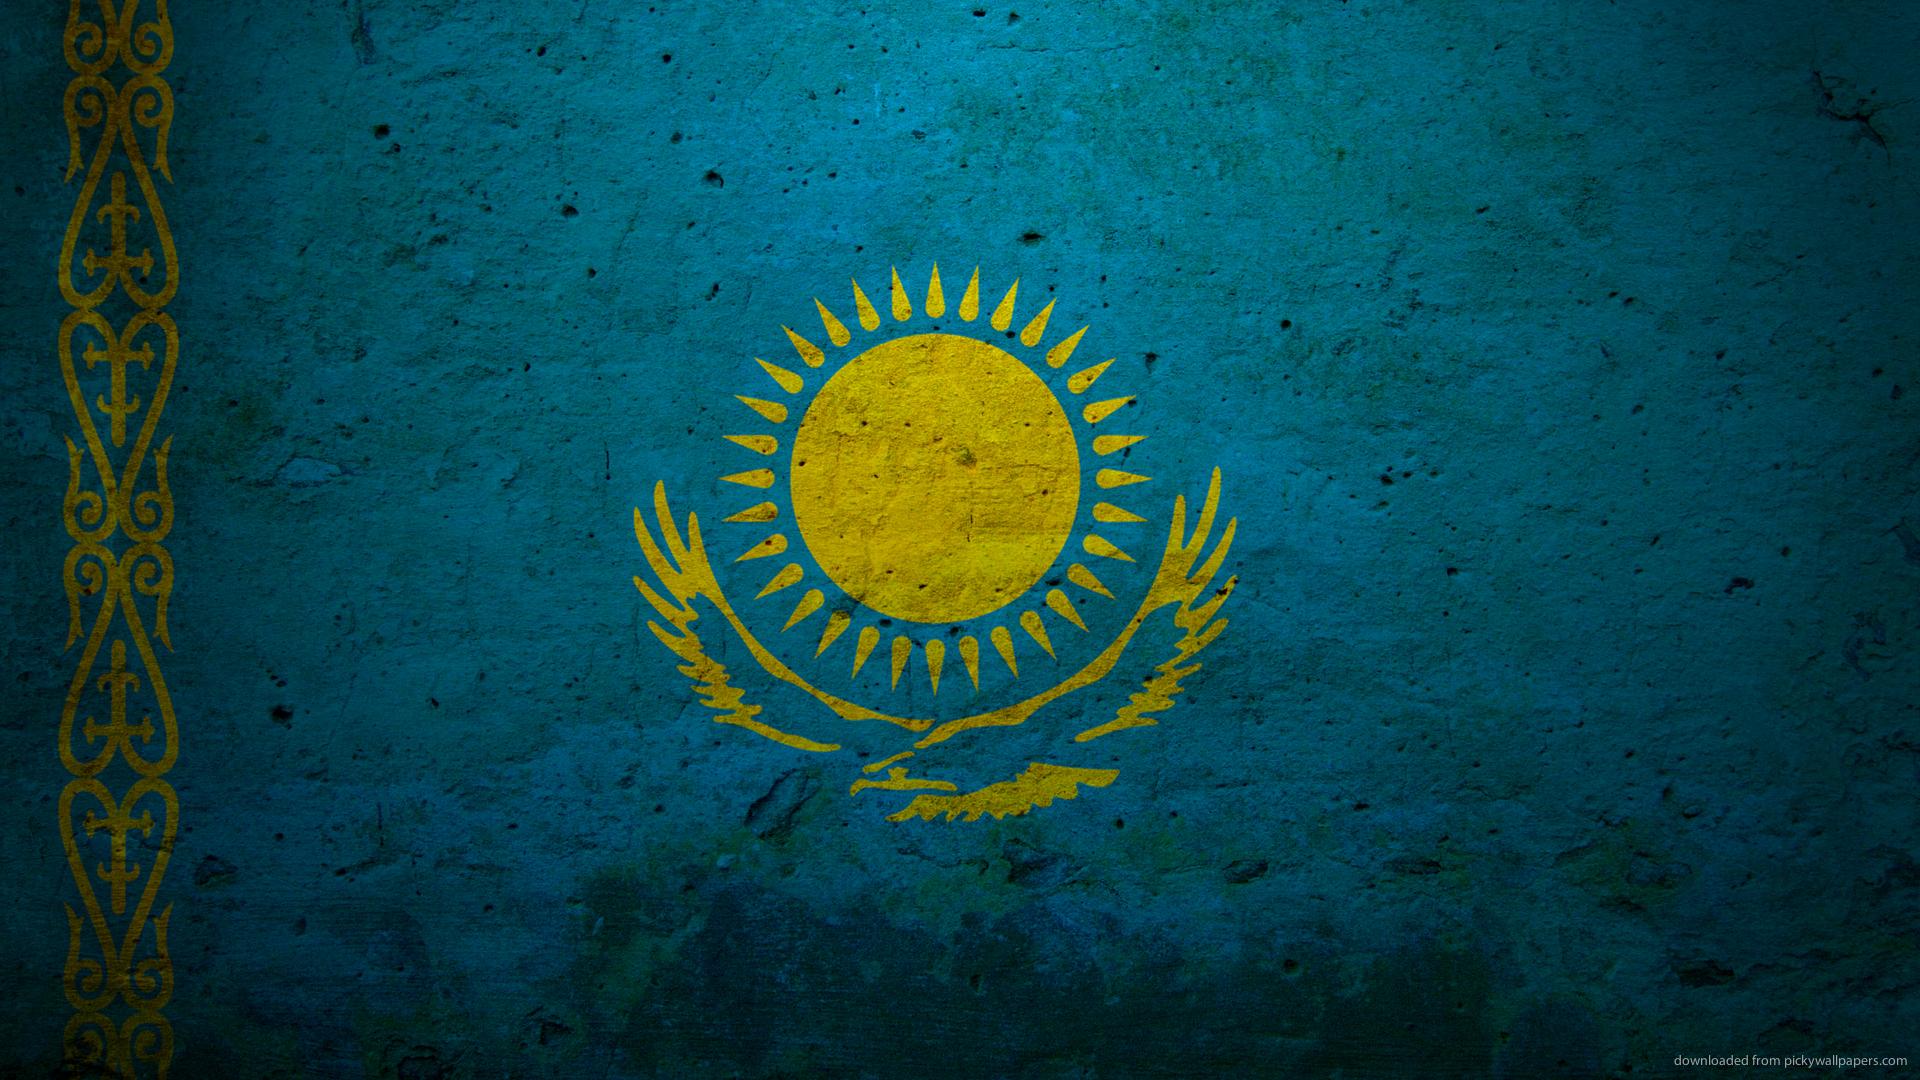 1920x1080 > Flag Of Kazakhstan Wallpapers